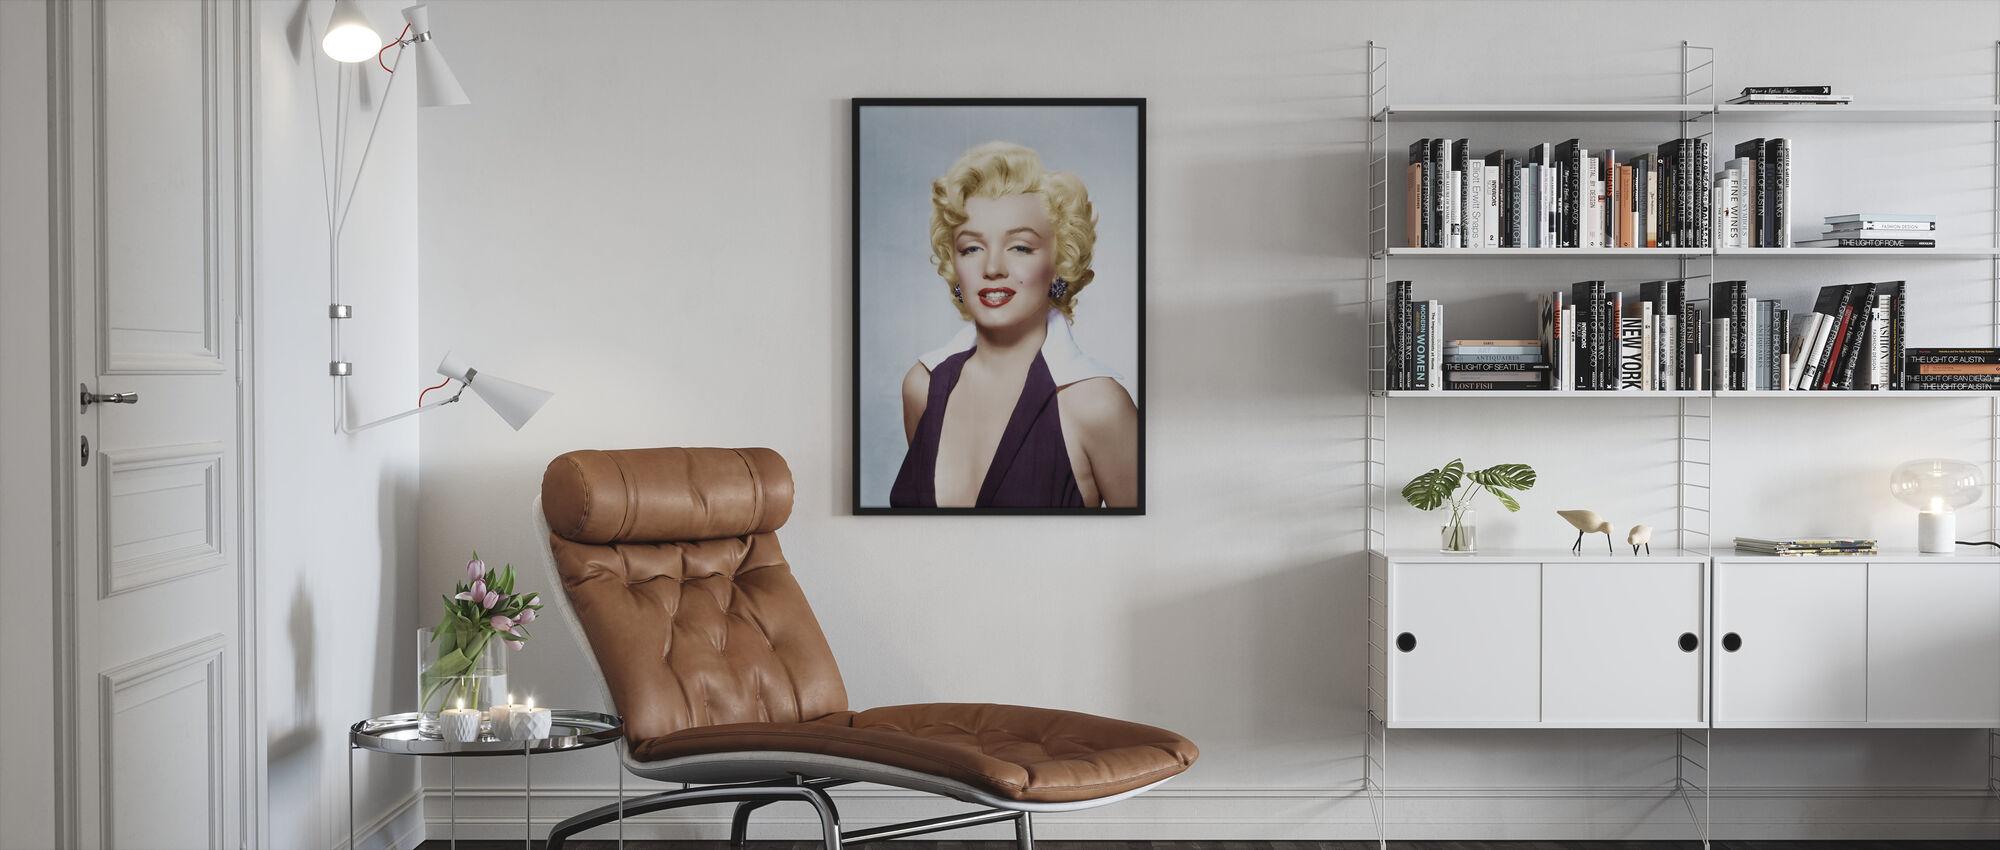 Blond - Innrammet bilde - Stue